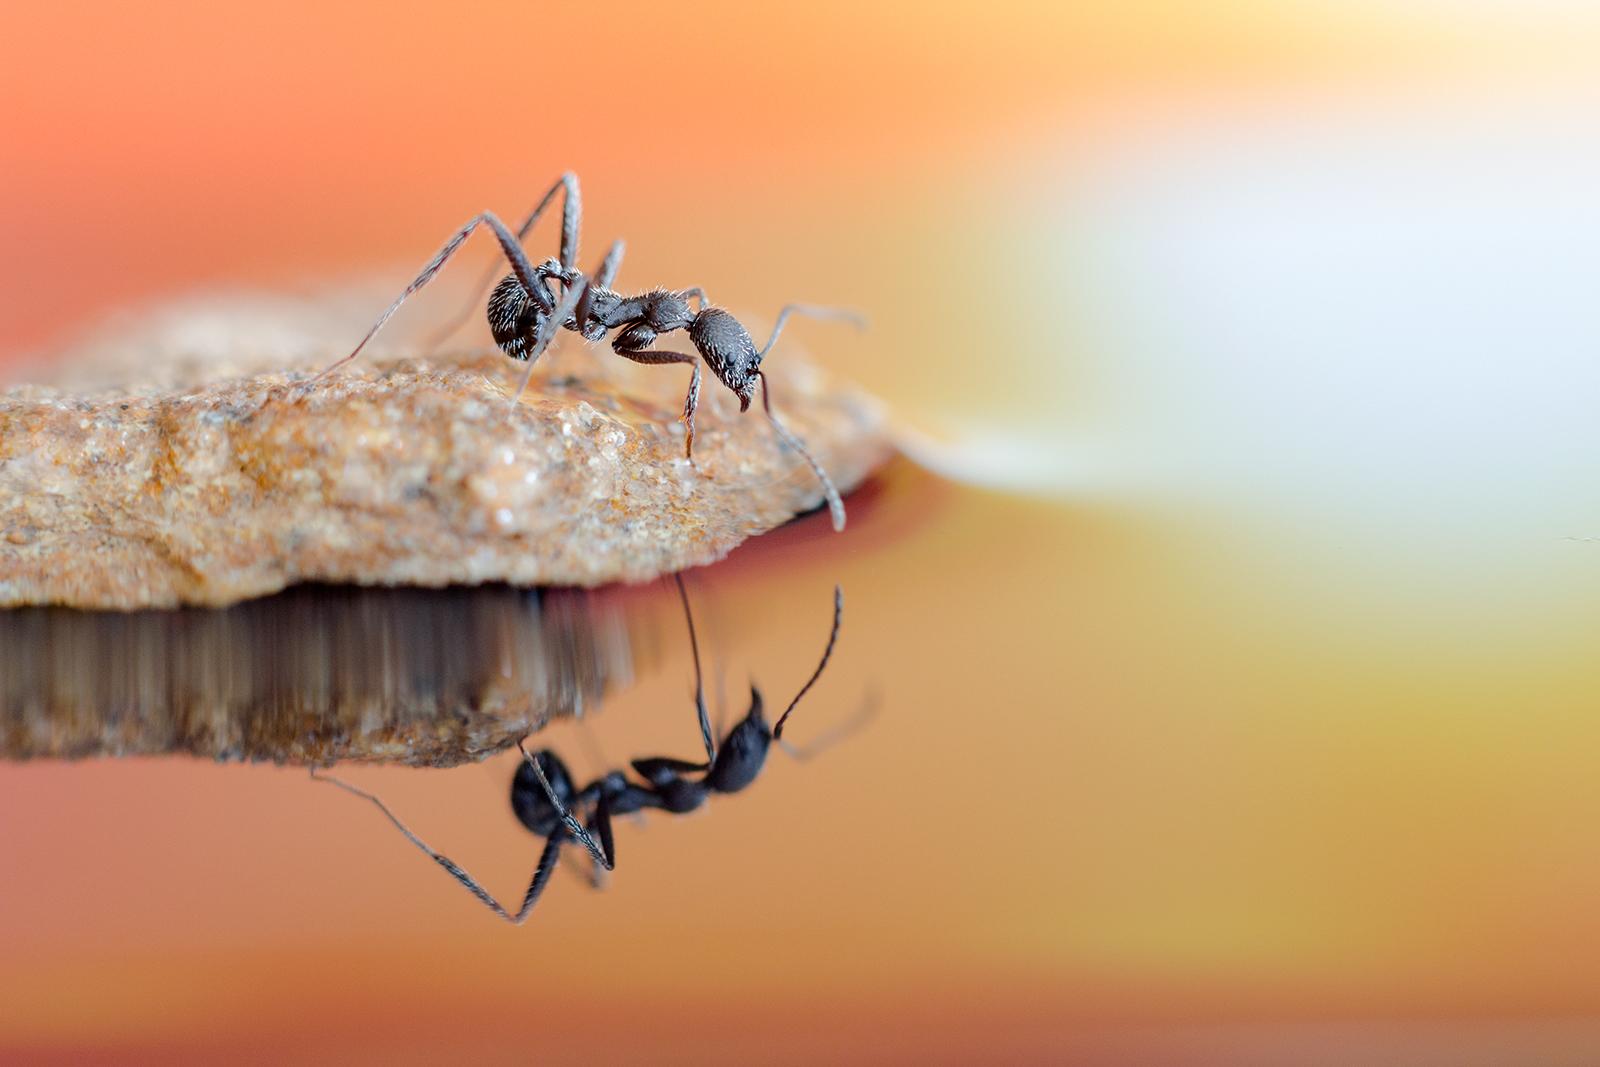 Foto macro de hormiga reflejada en agua, Canon, Tamron 90mm,Danilatorre,danilatorre, Dani Latorre, daniel Latorre